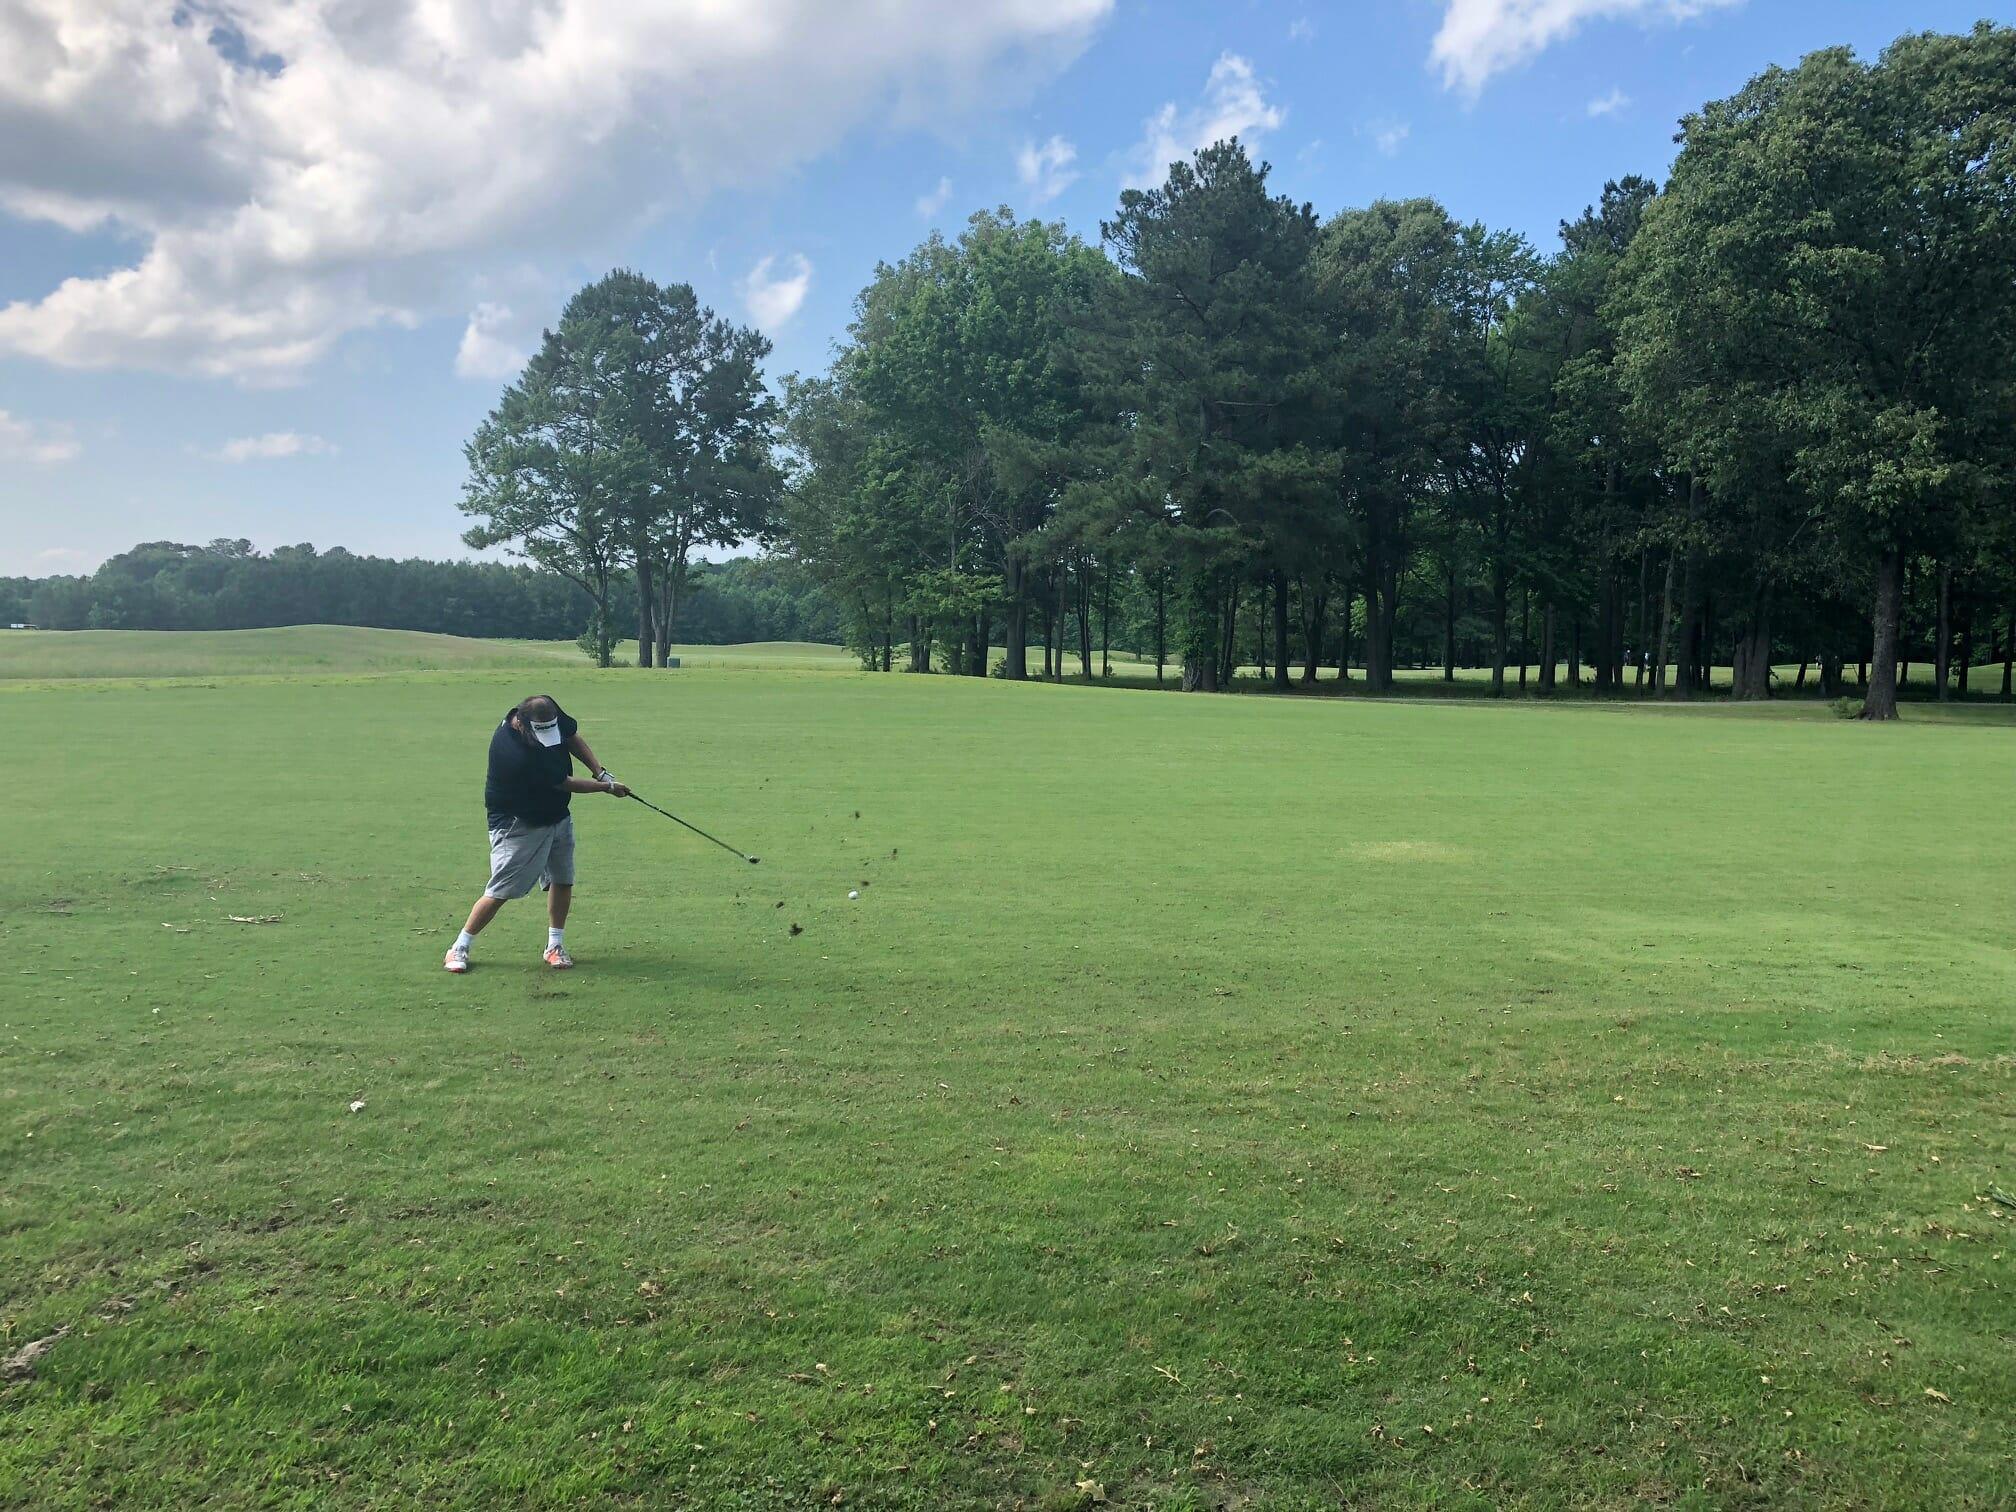 Jason Swango shows his skills at Aeropines Golf Club